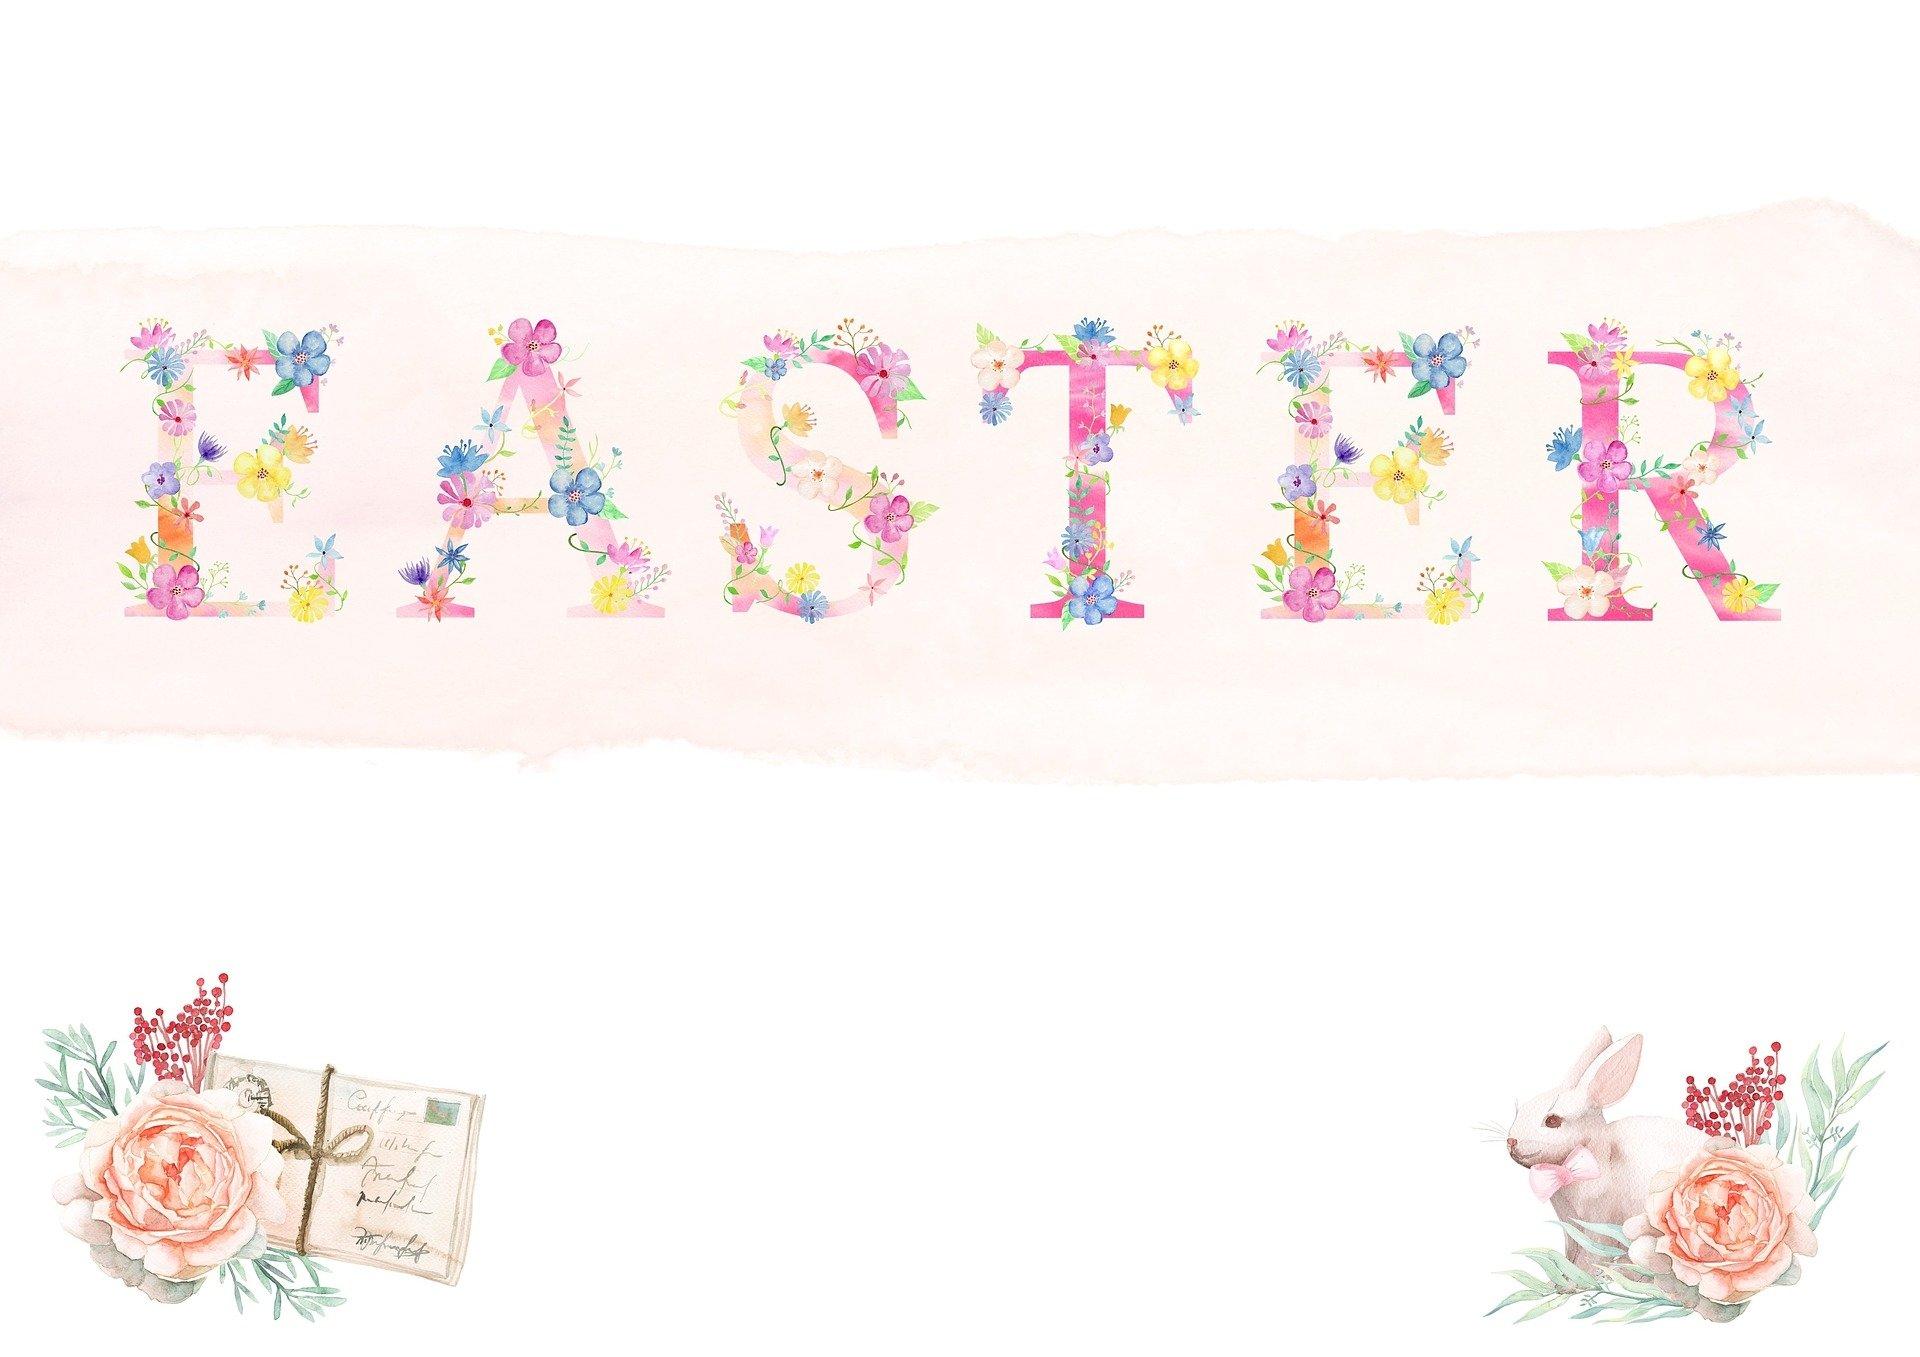 Feiertage - Ostern  Wallpaper